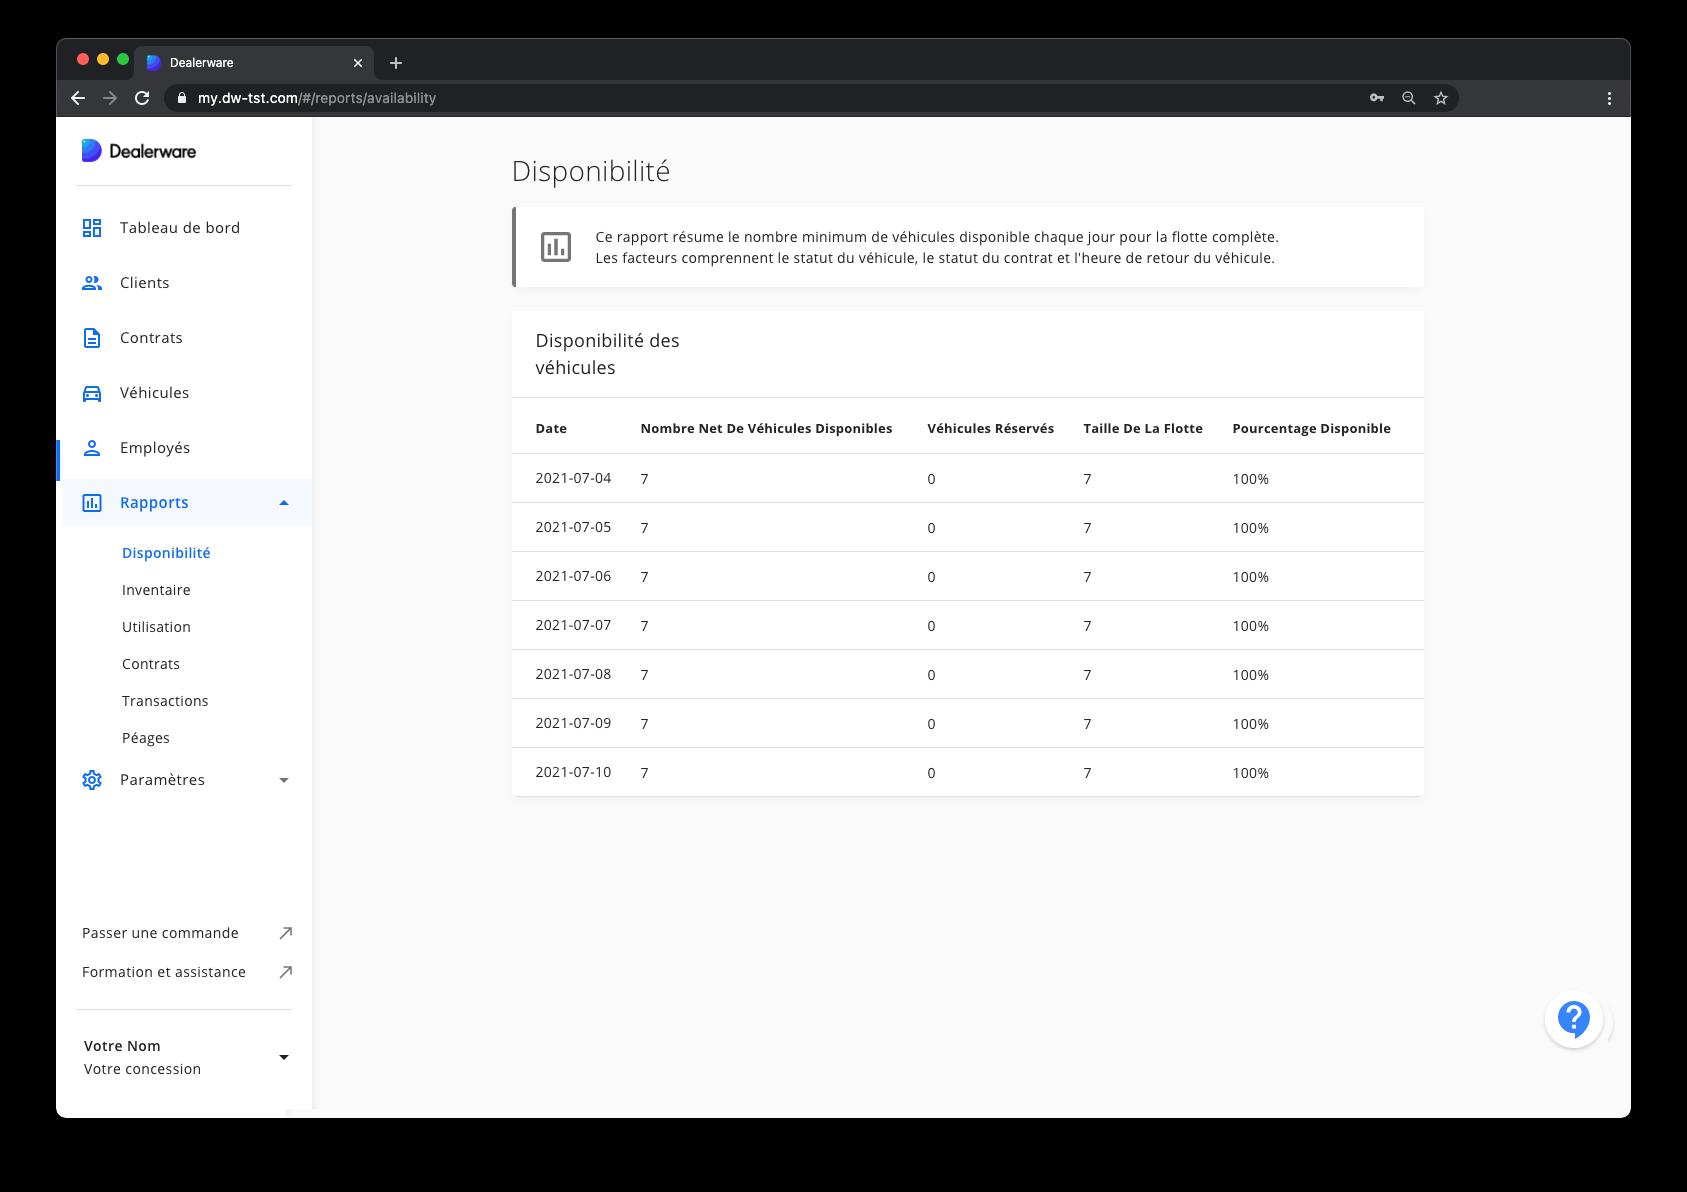 availability_report_en-us.png